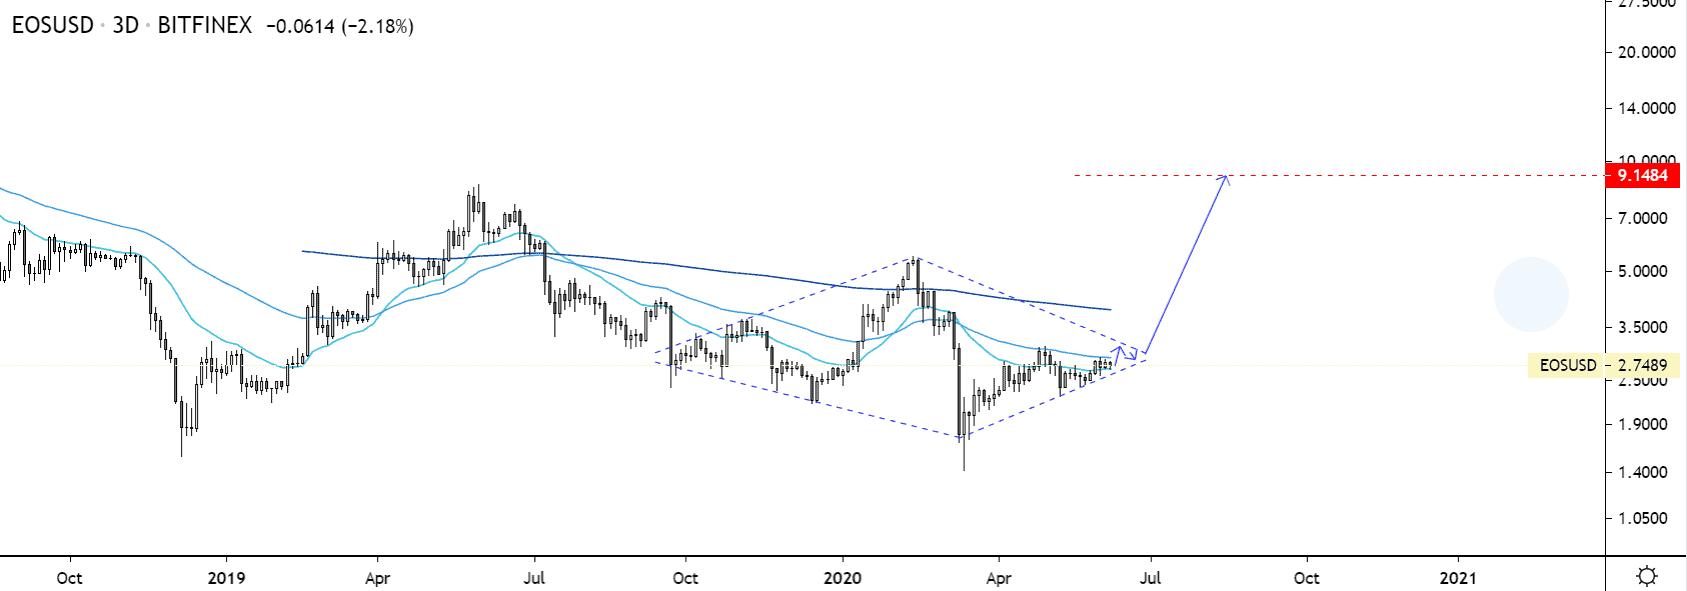 EOS price chart 3 - Jun9